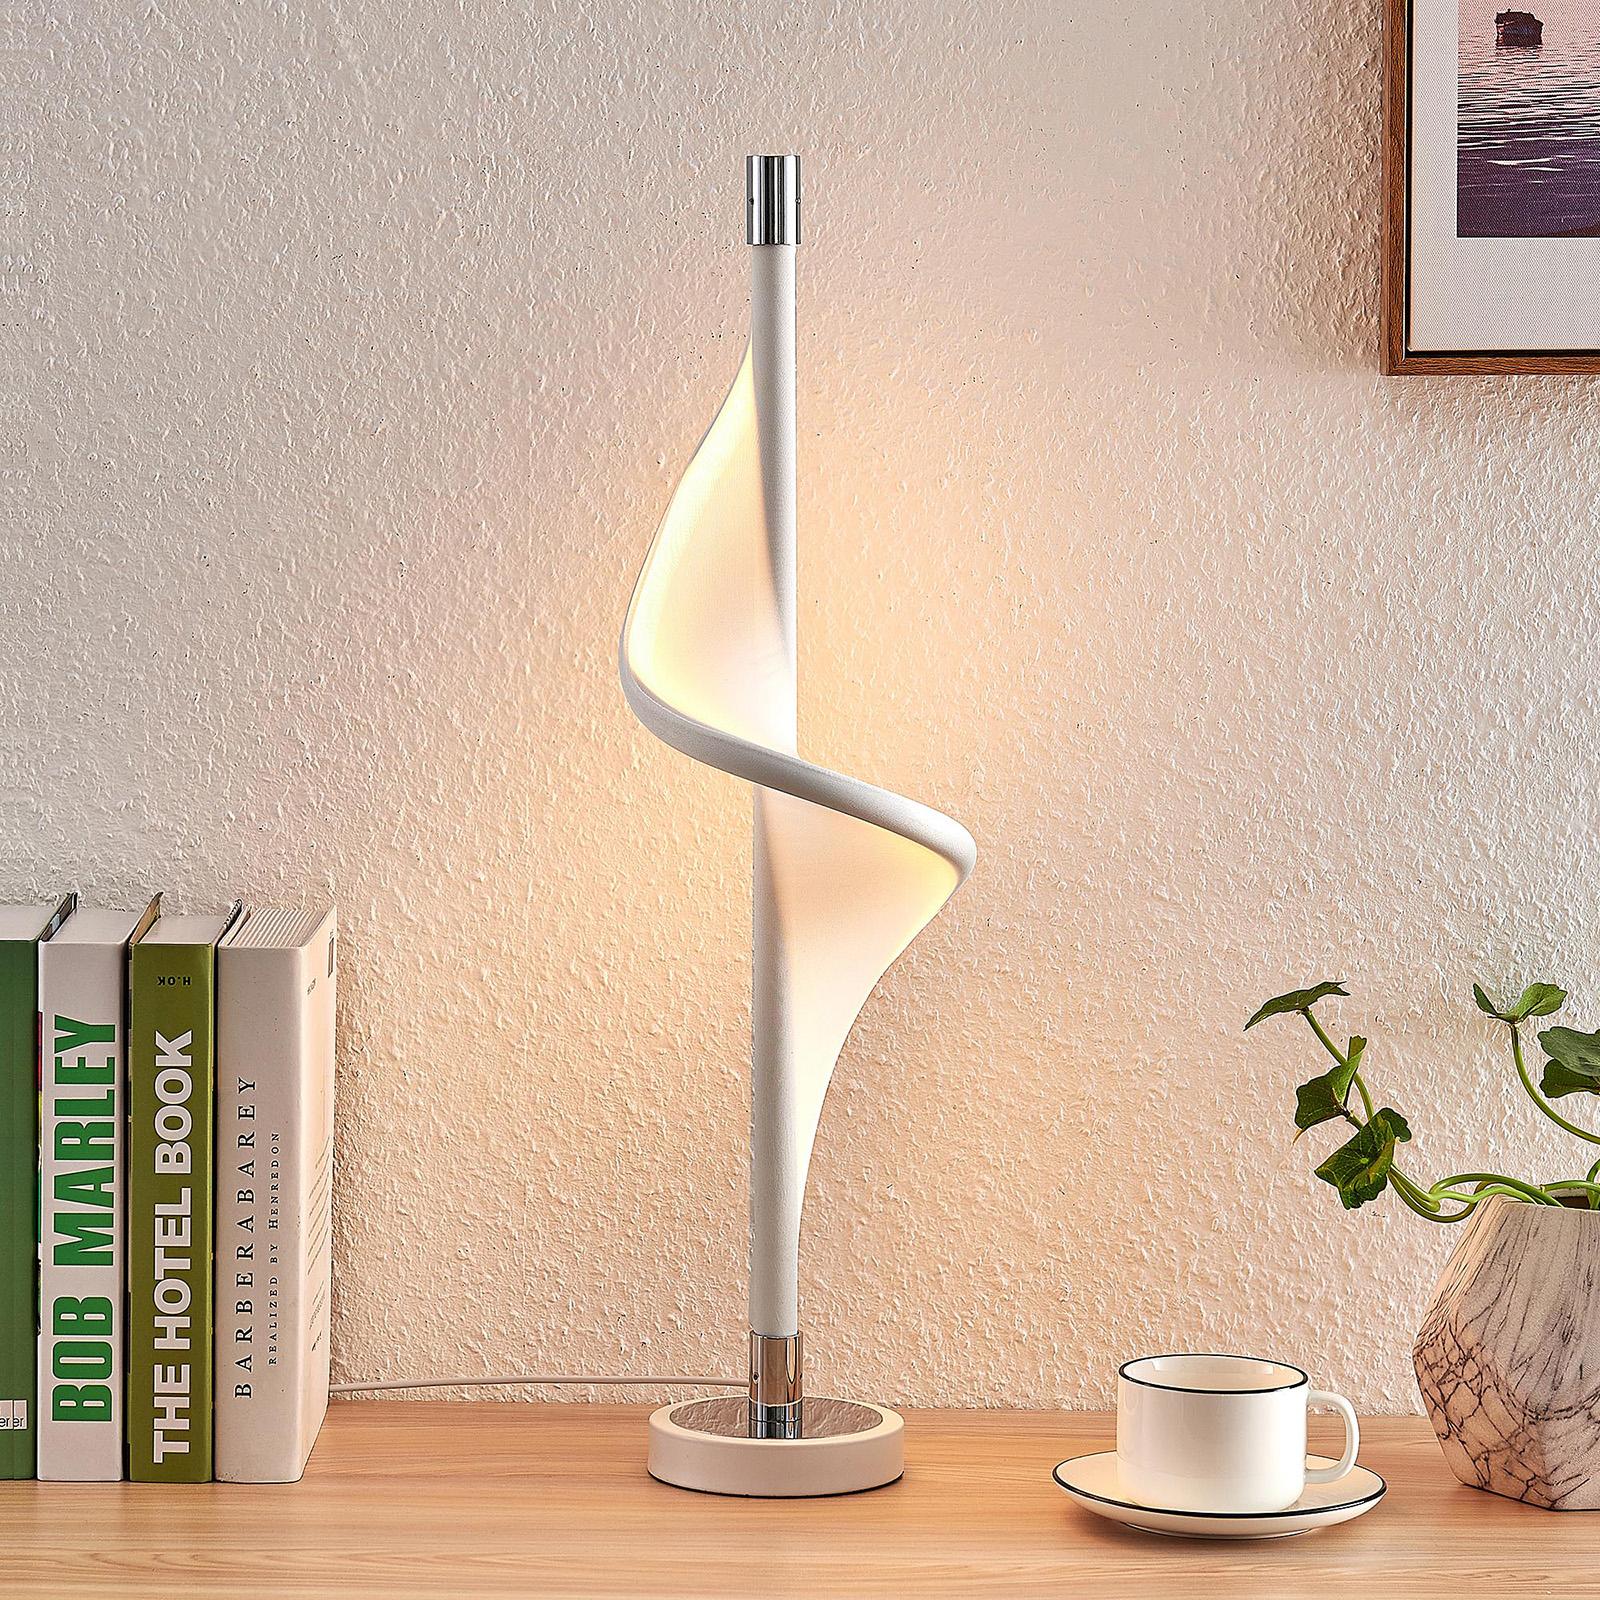 Lucande Edano lampe à poser LED de forme torsadée